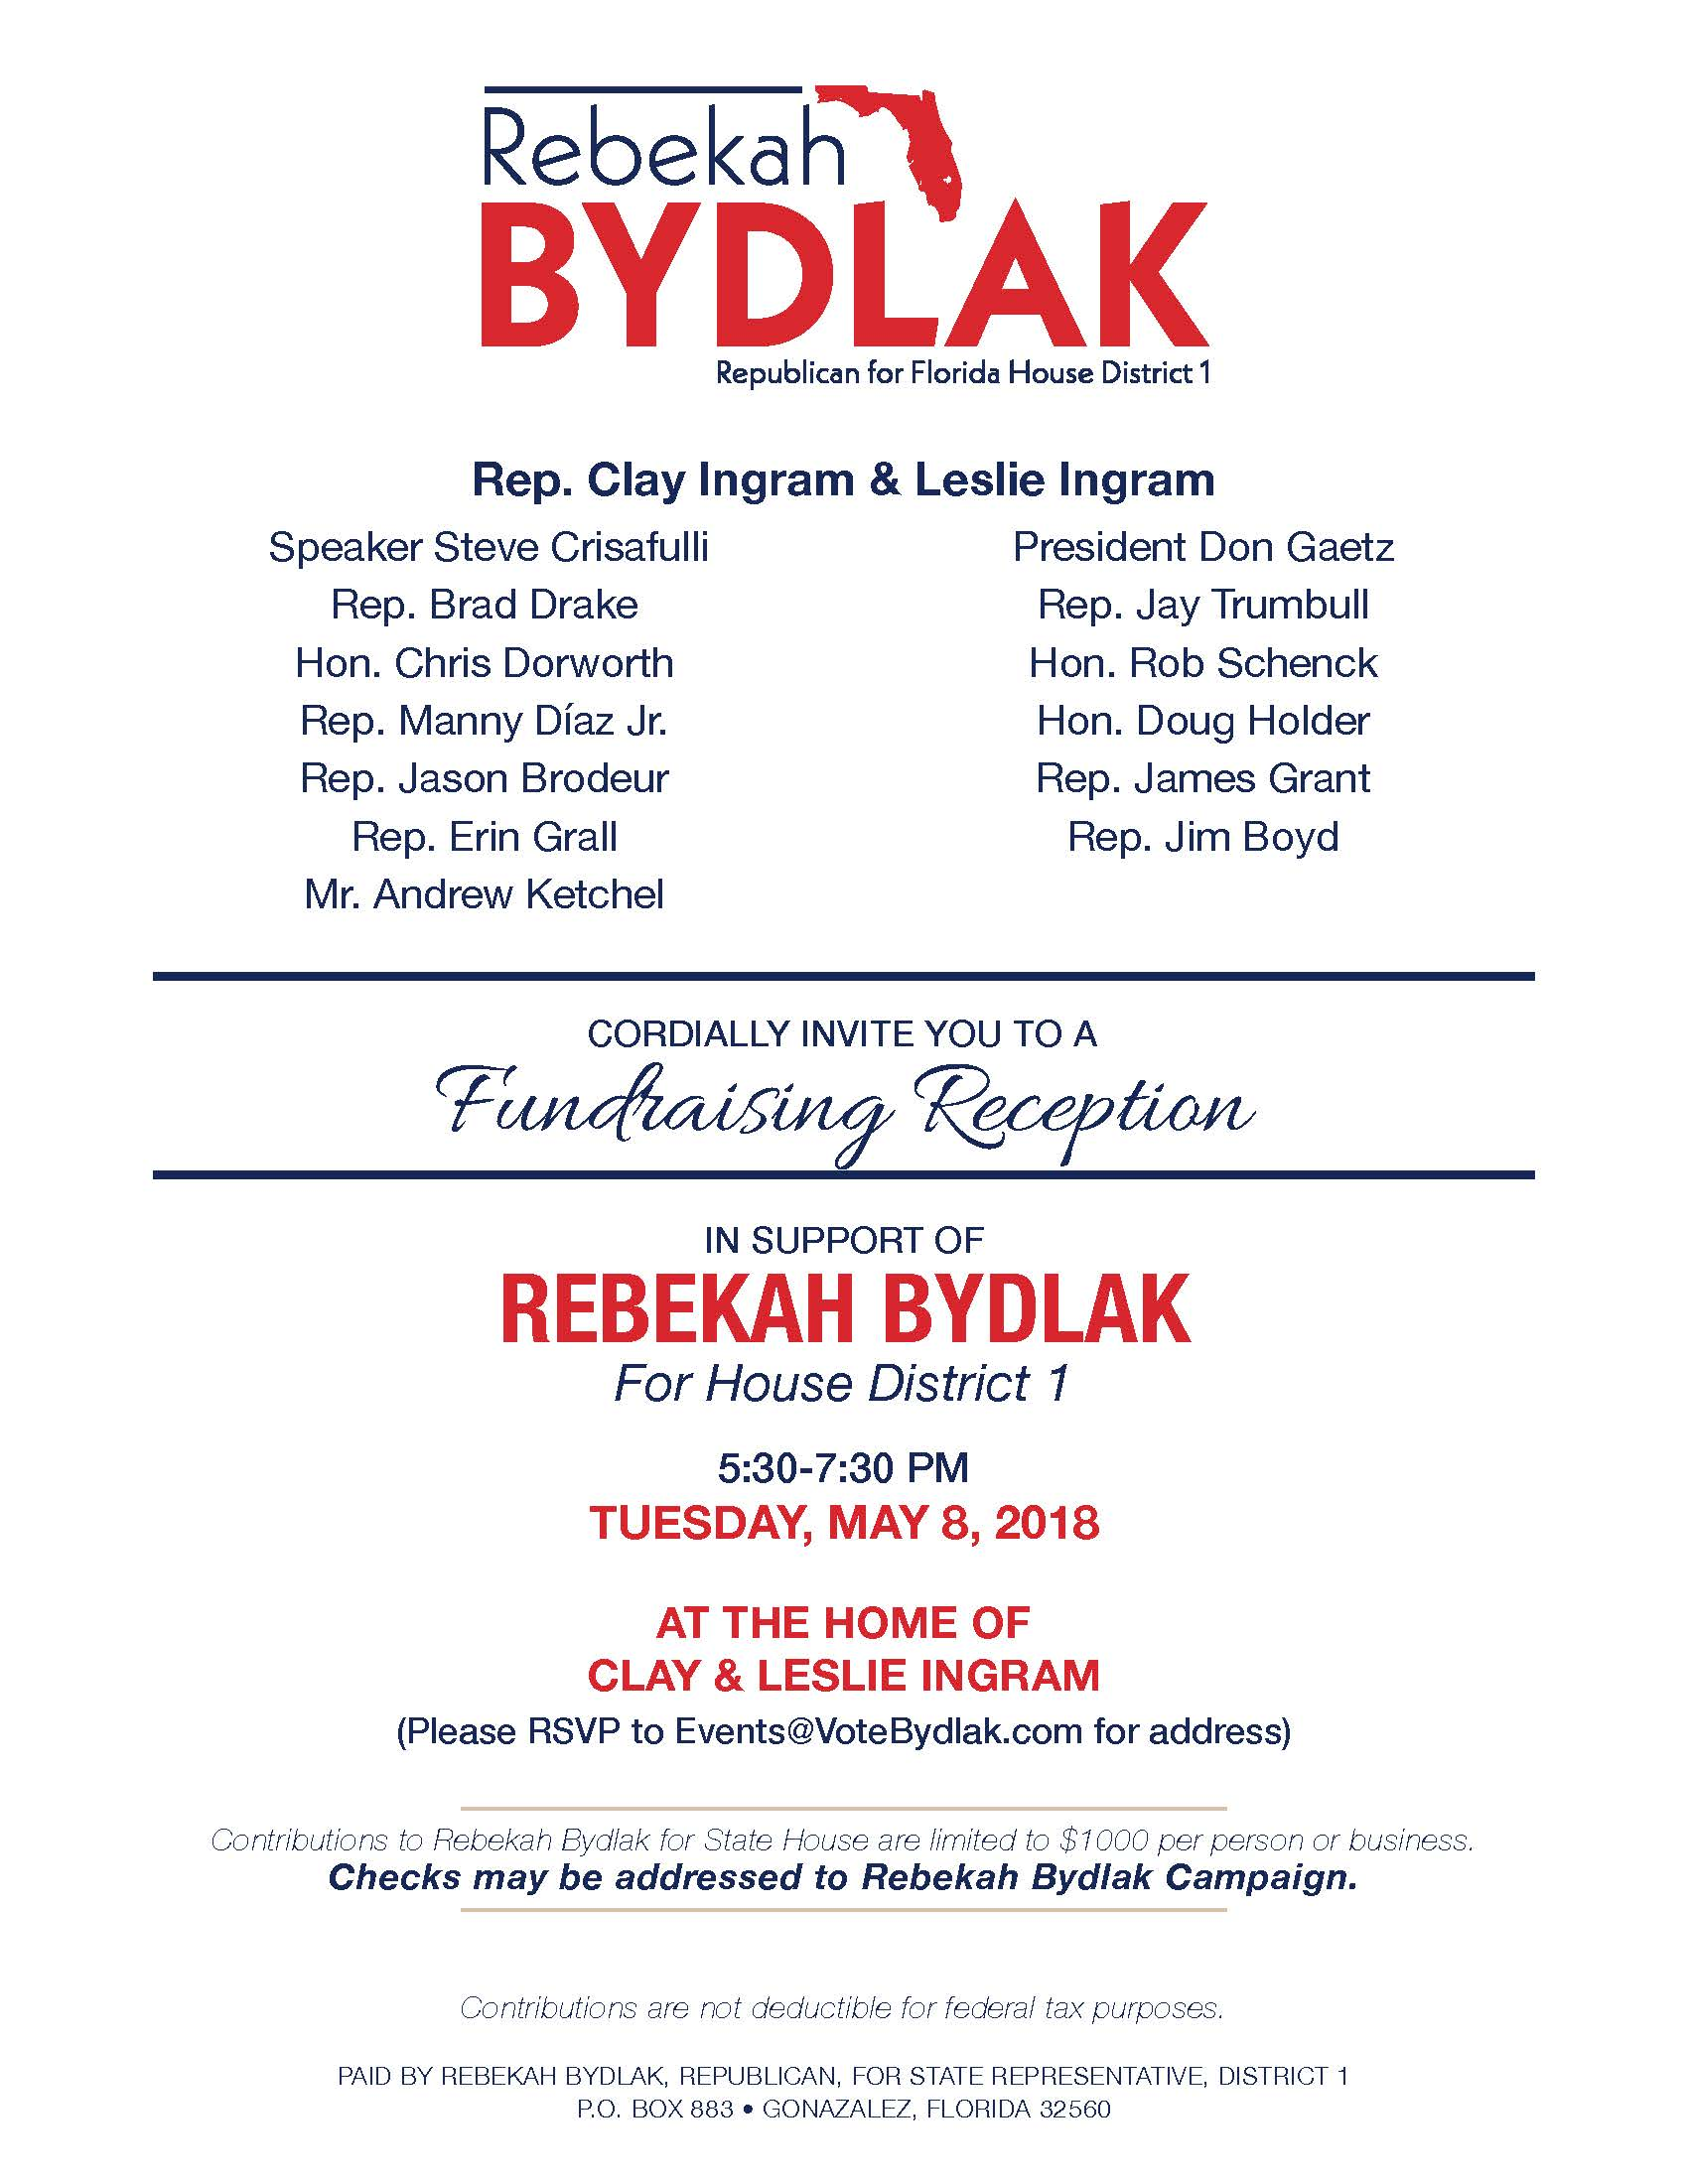 Bydlak fundraiser 5.9.2018